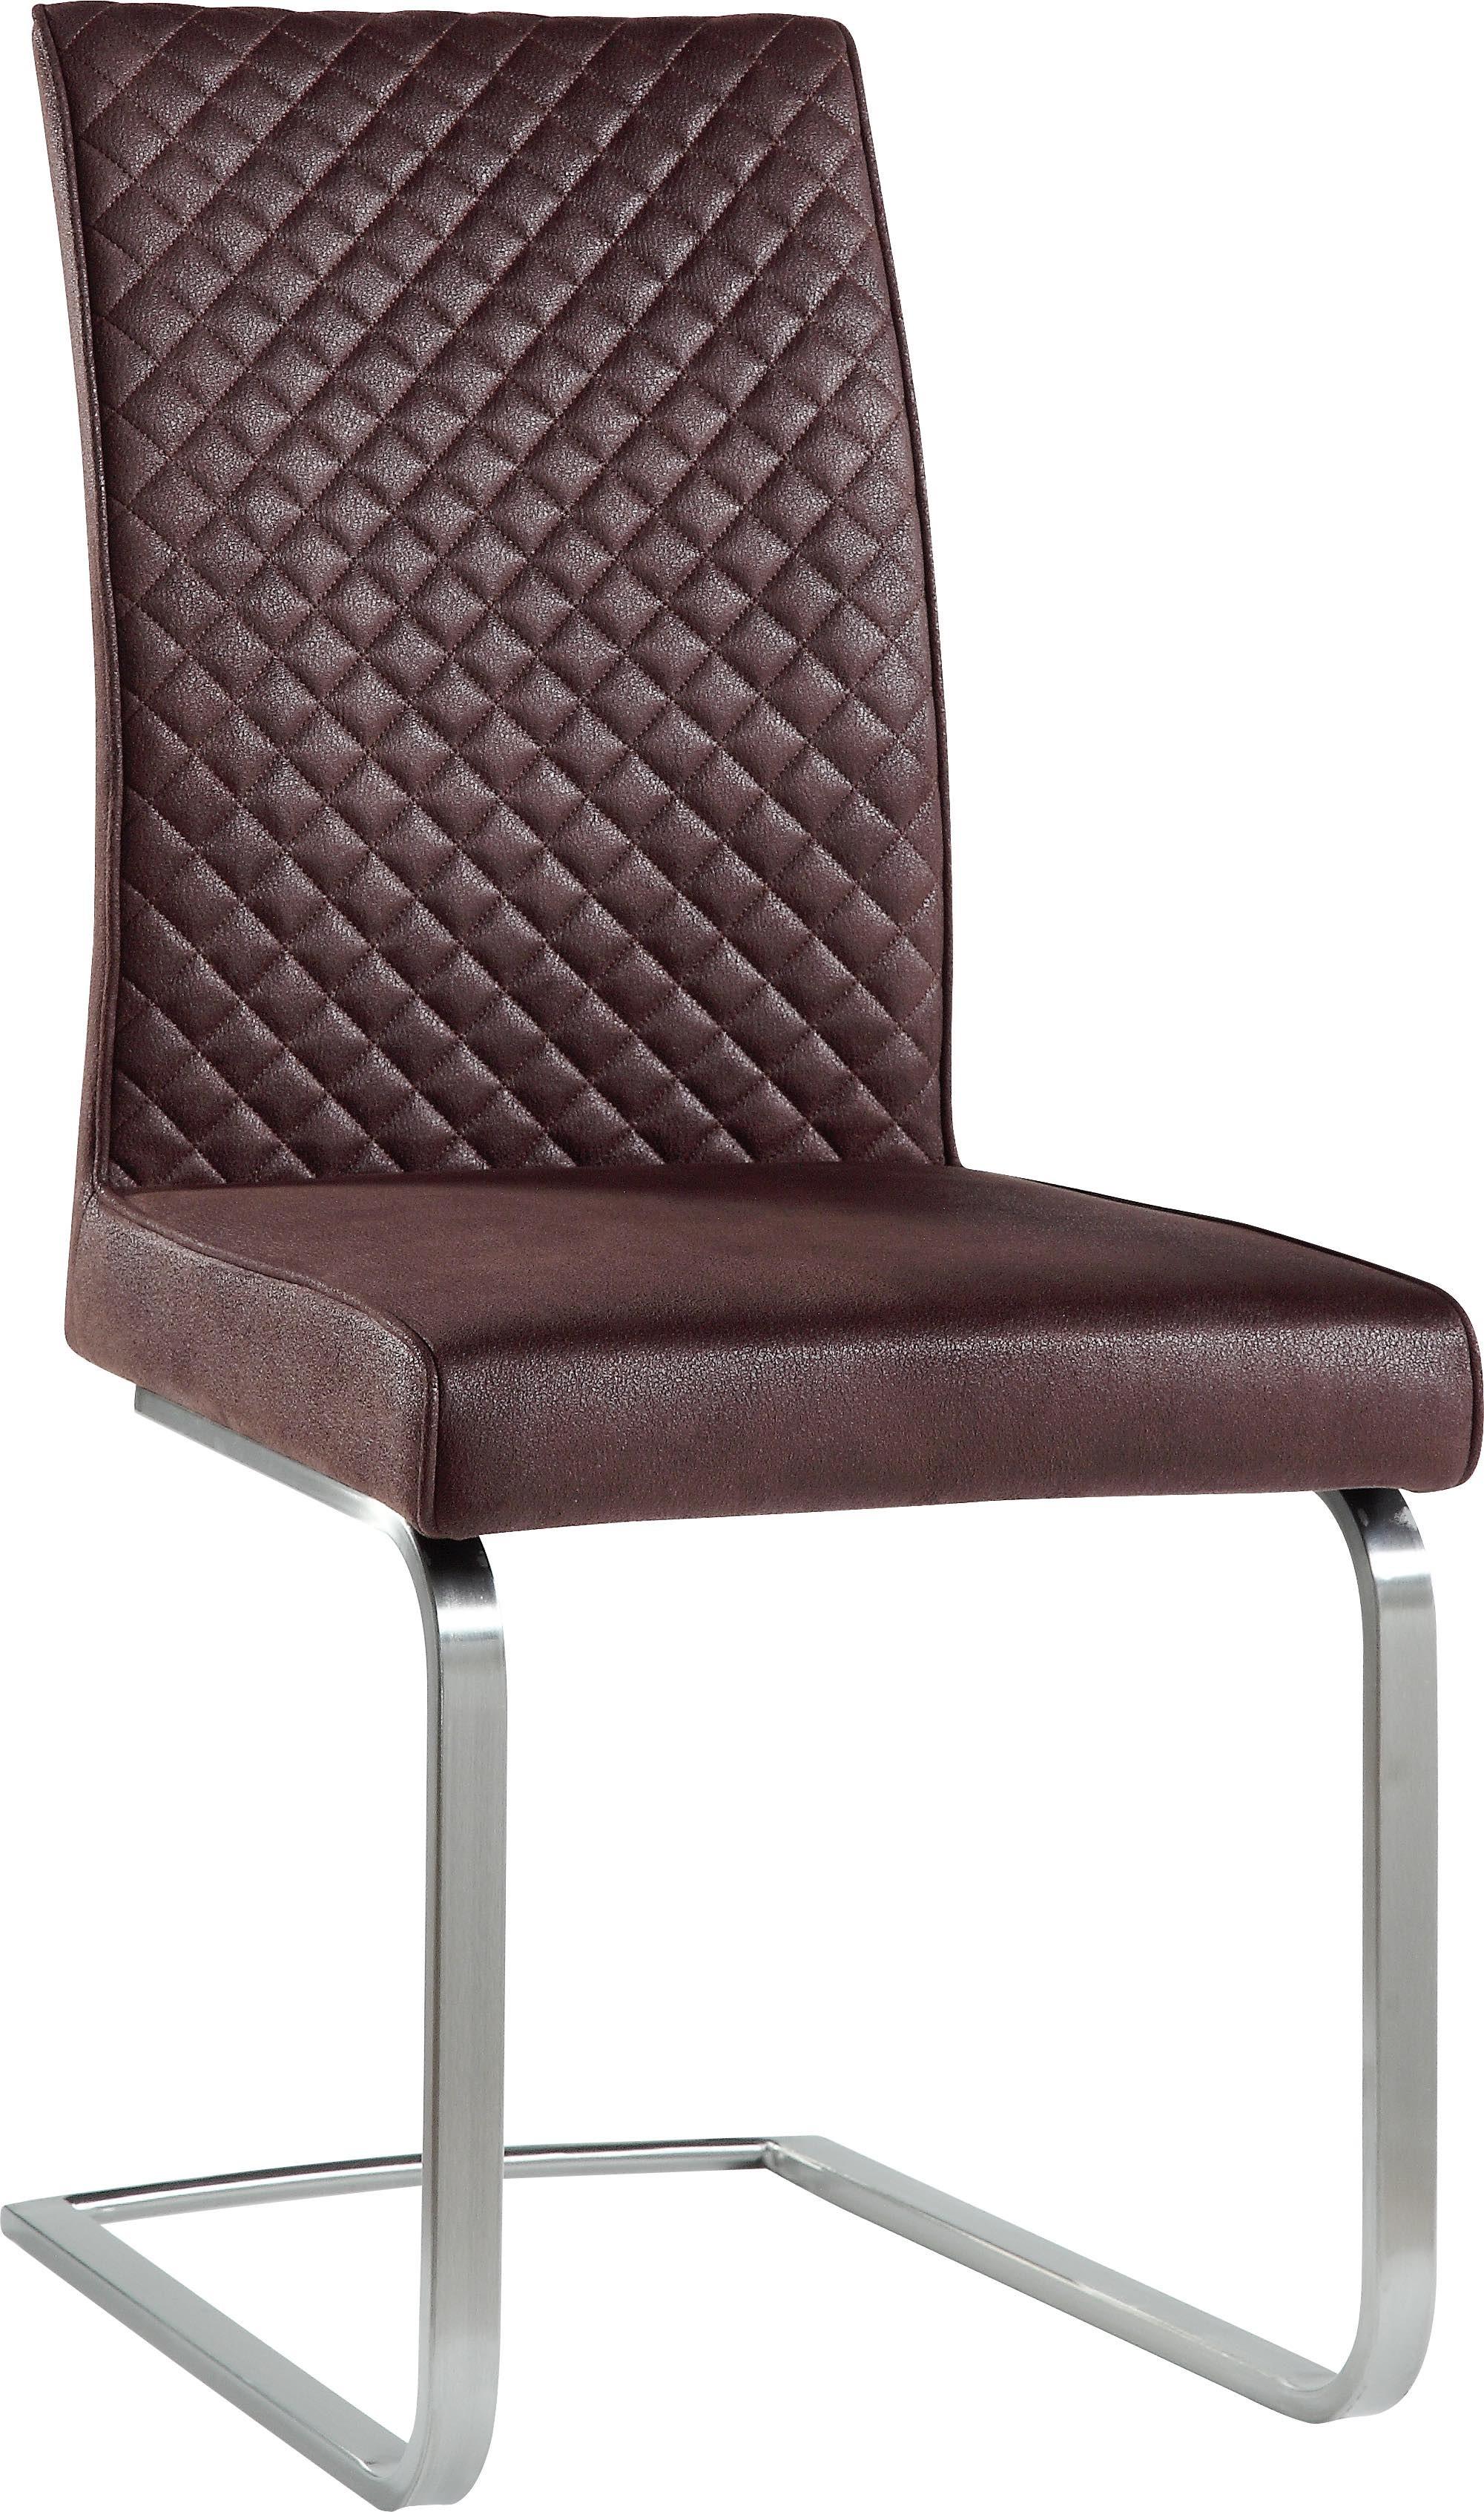 6750 Modern Dinning Room Chair